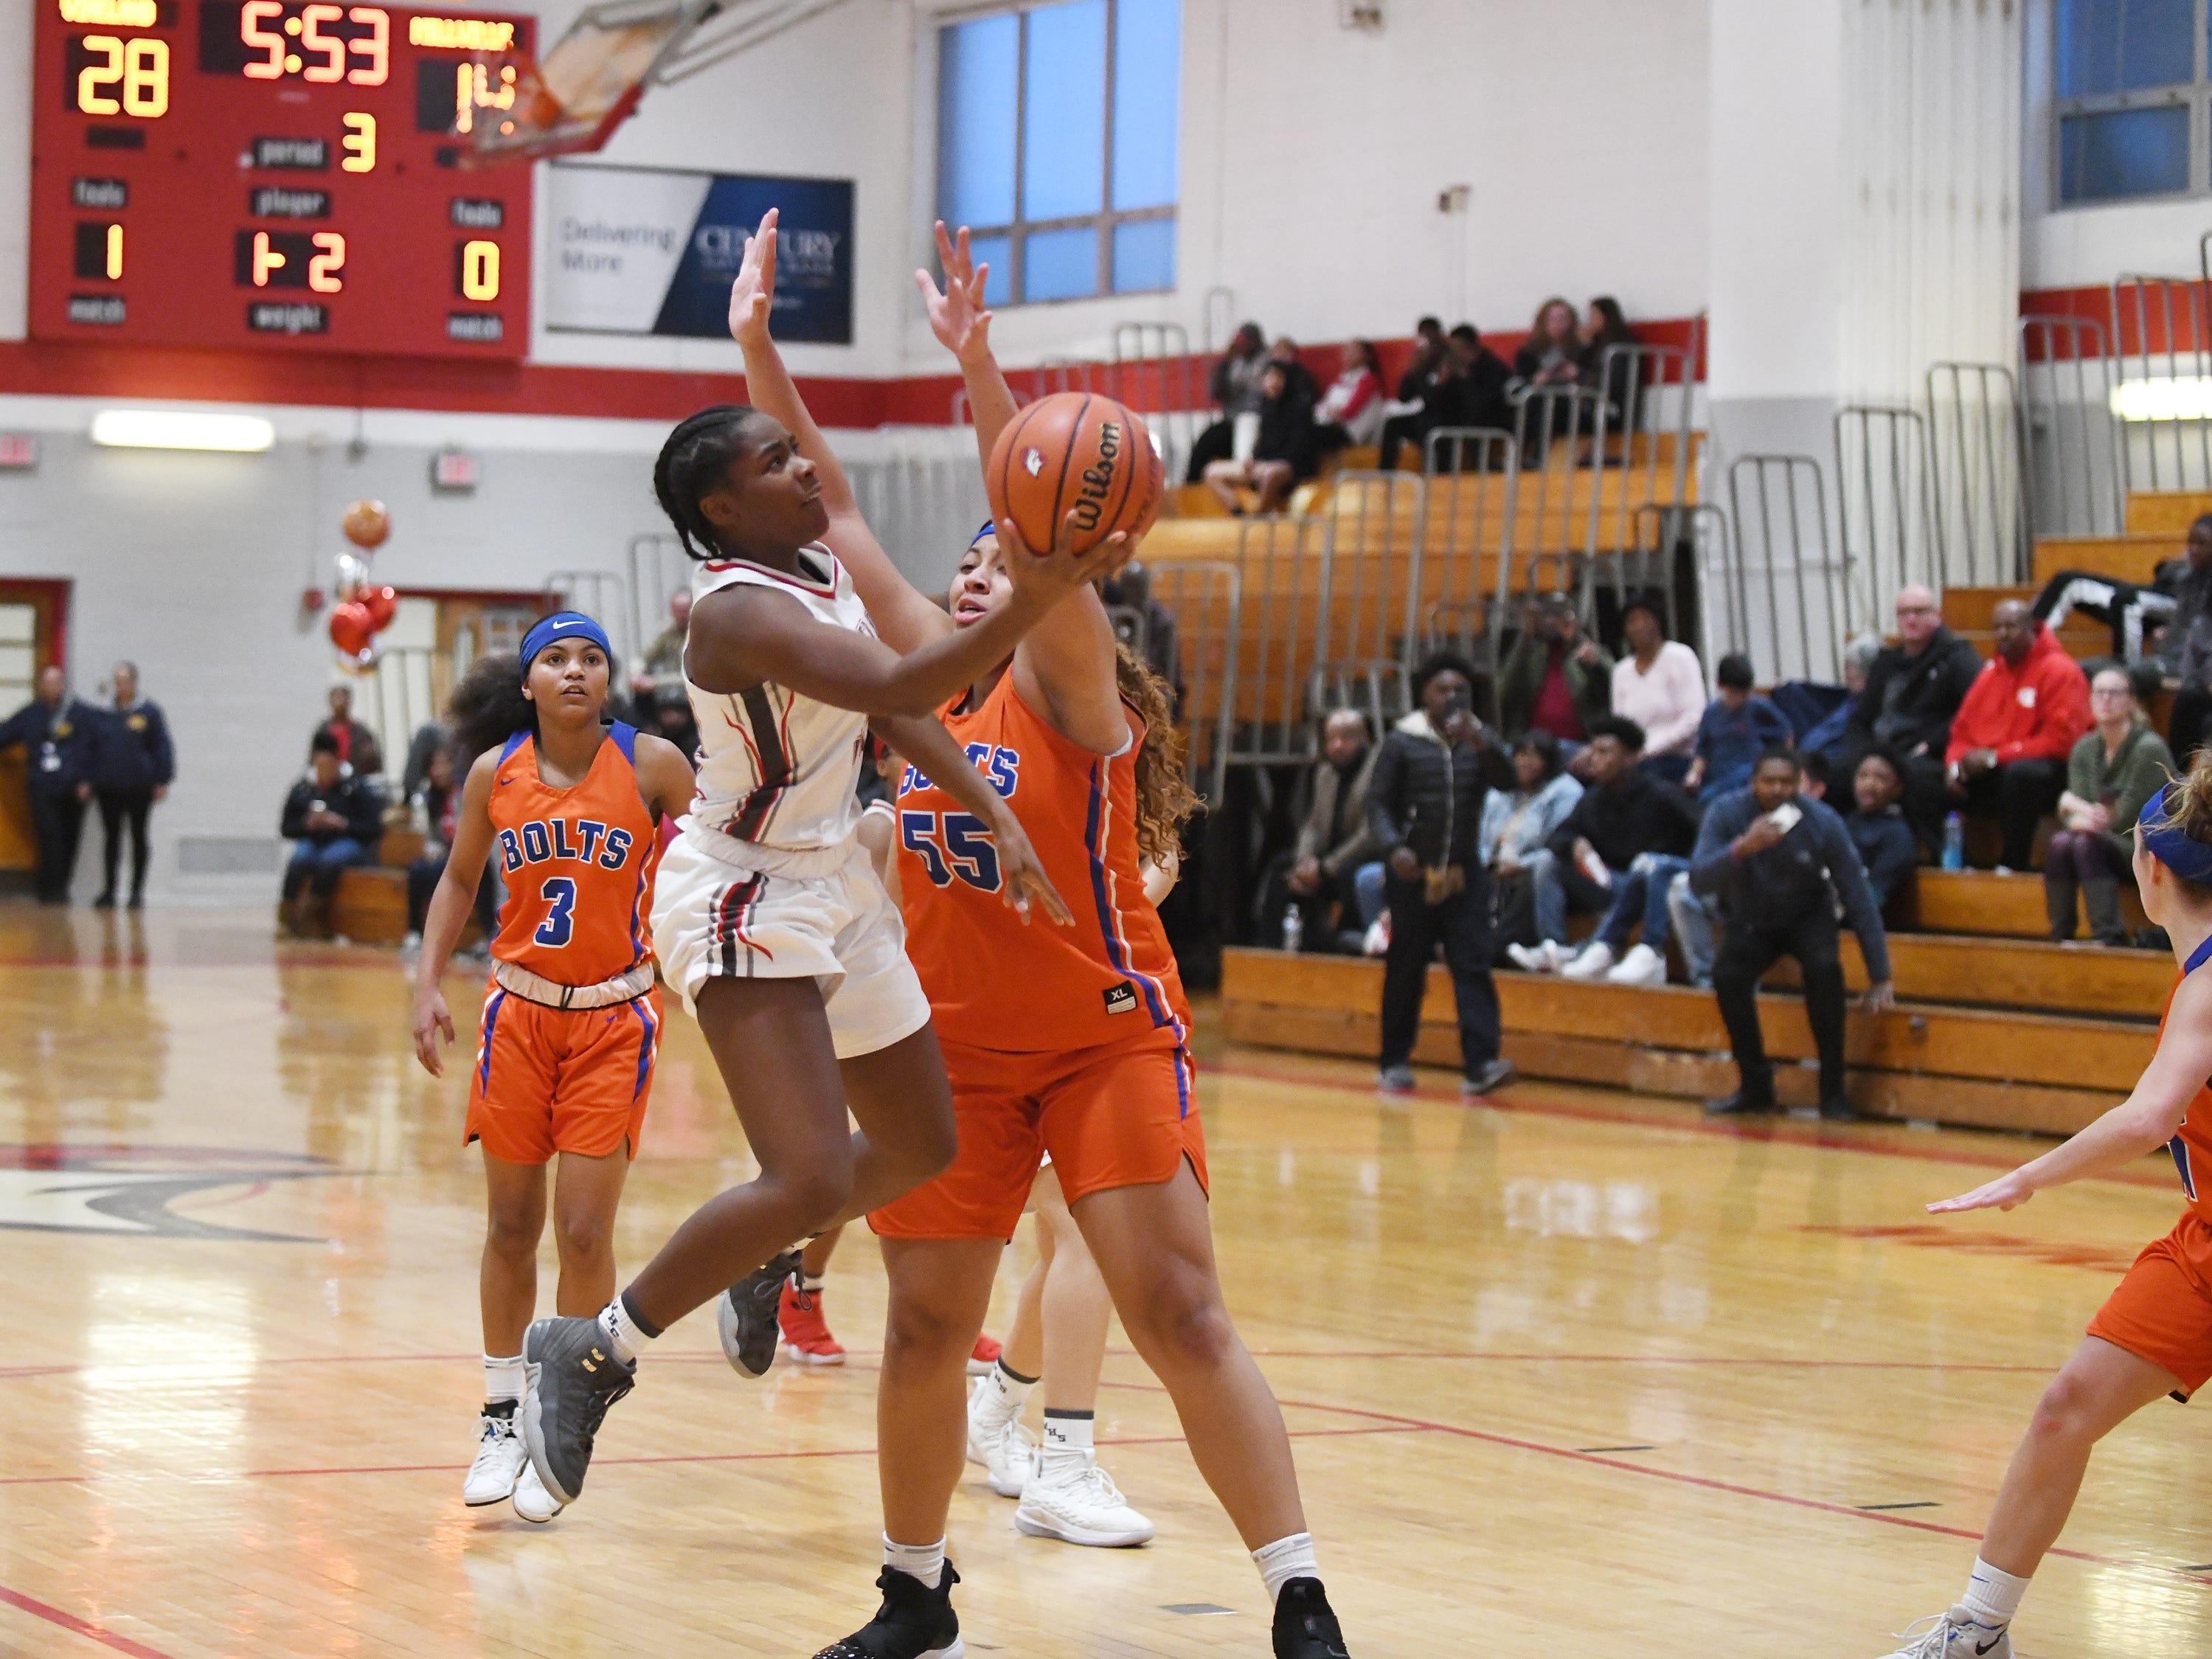 Vineland High School senior Briel Herbert scores her 1,000th career point on this shot against Millville. Vineland defeated Millville 57-35 on Wednesday, Jan. 16, 2019.